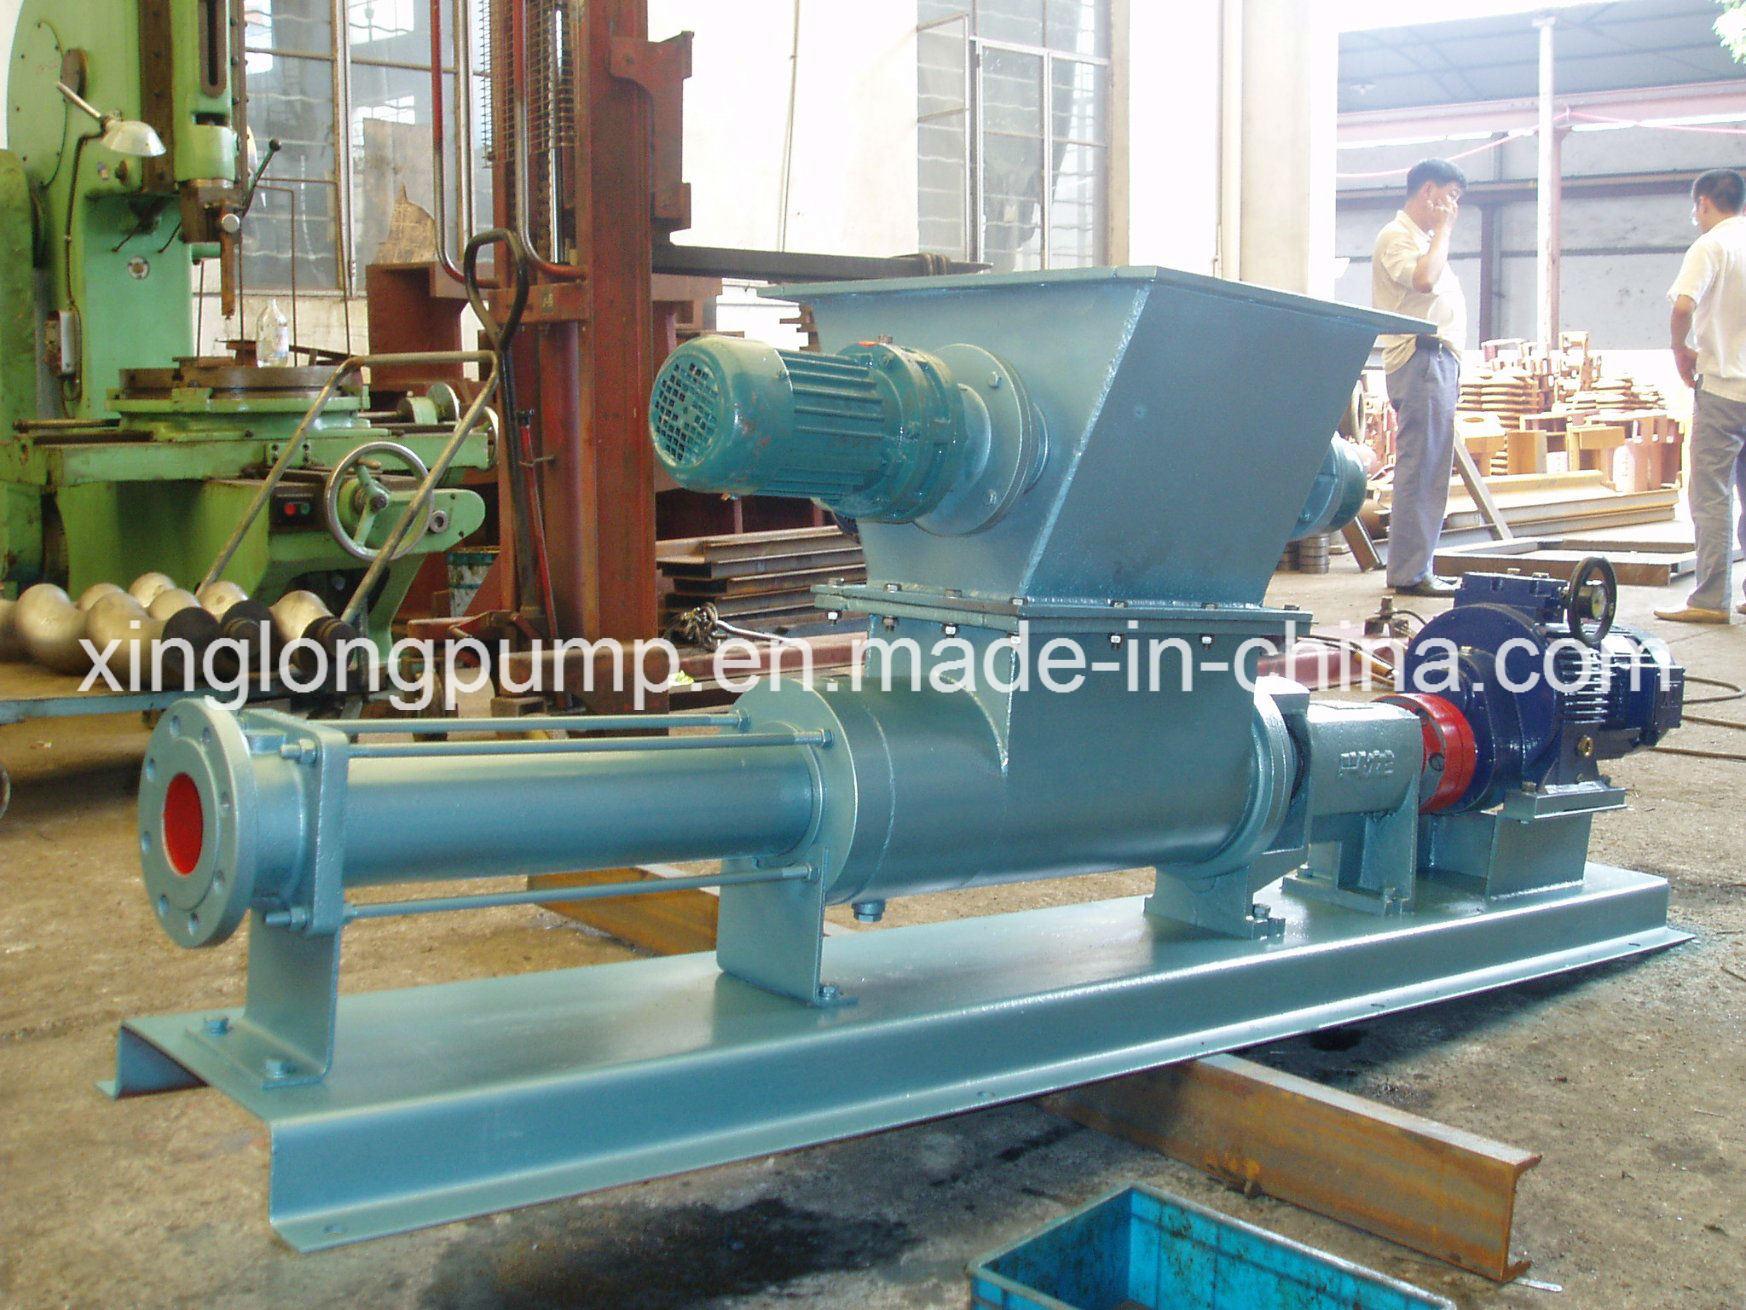 Professional Single Screw Pump with Ce Certificate